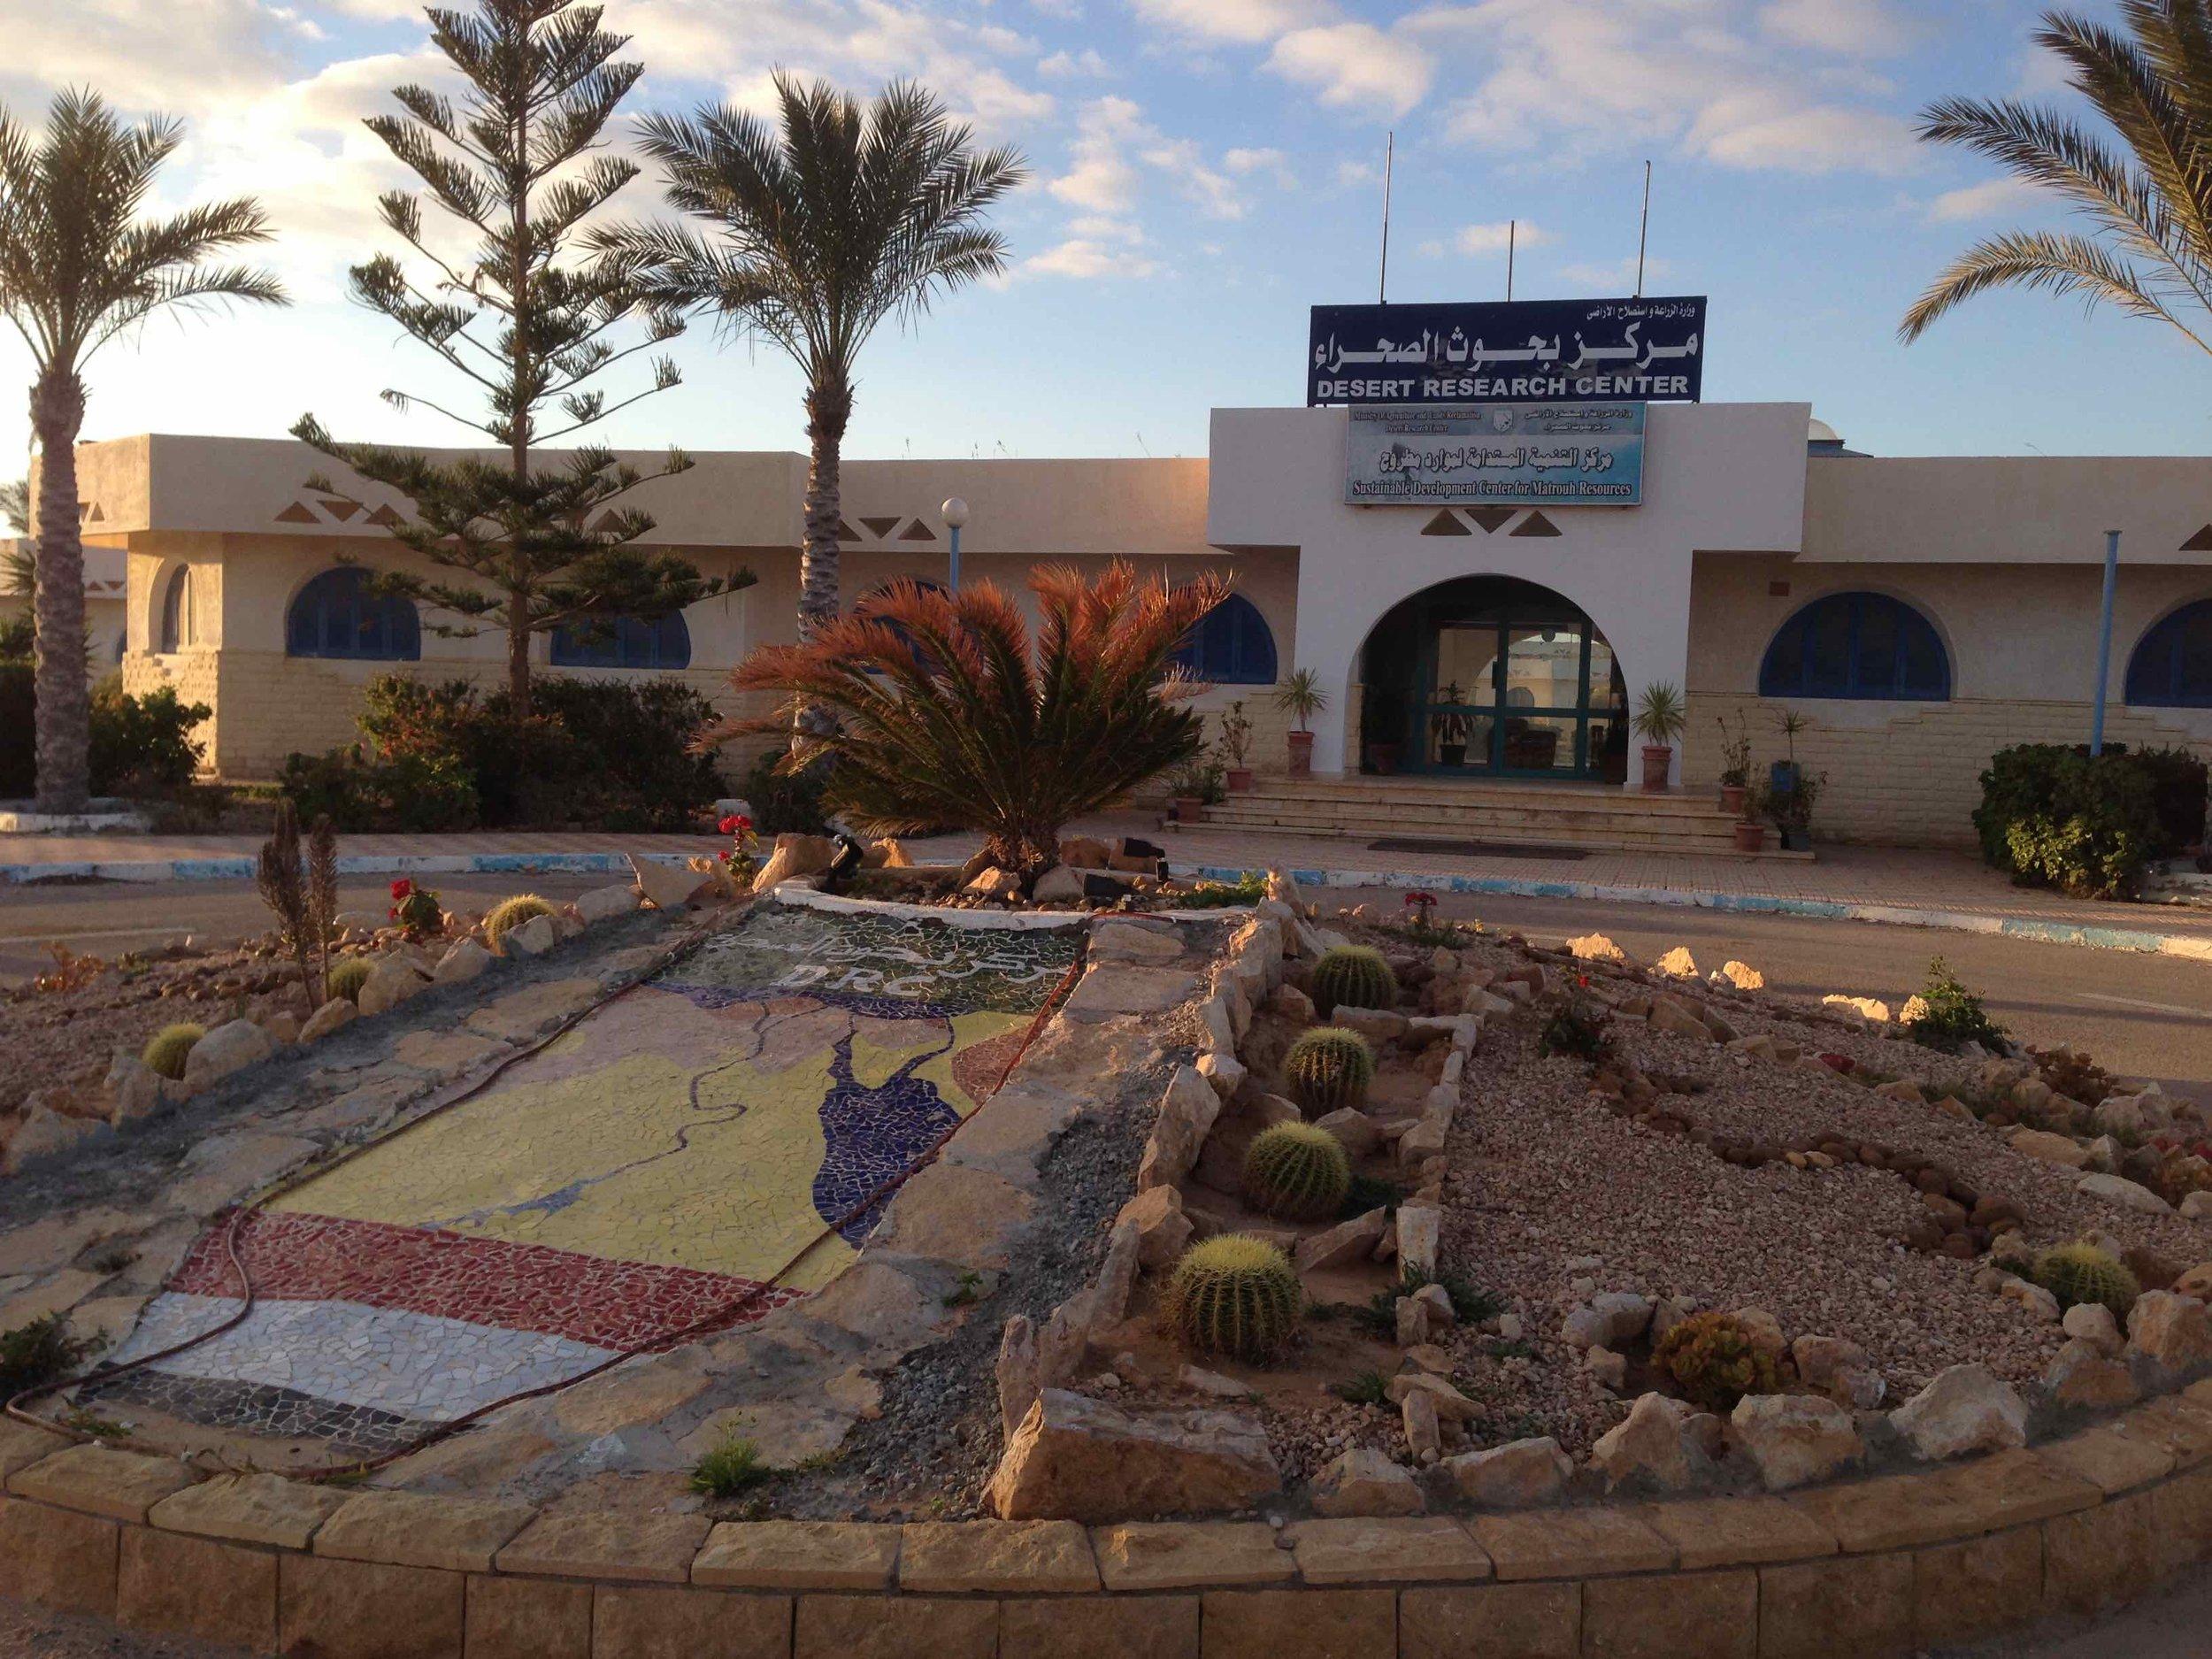 DESERT RESEARCH CENTER in Marsa Matrouh